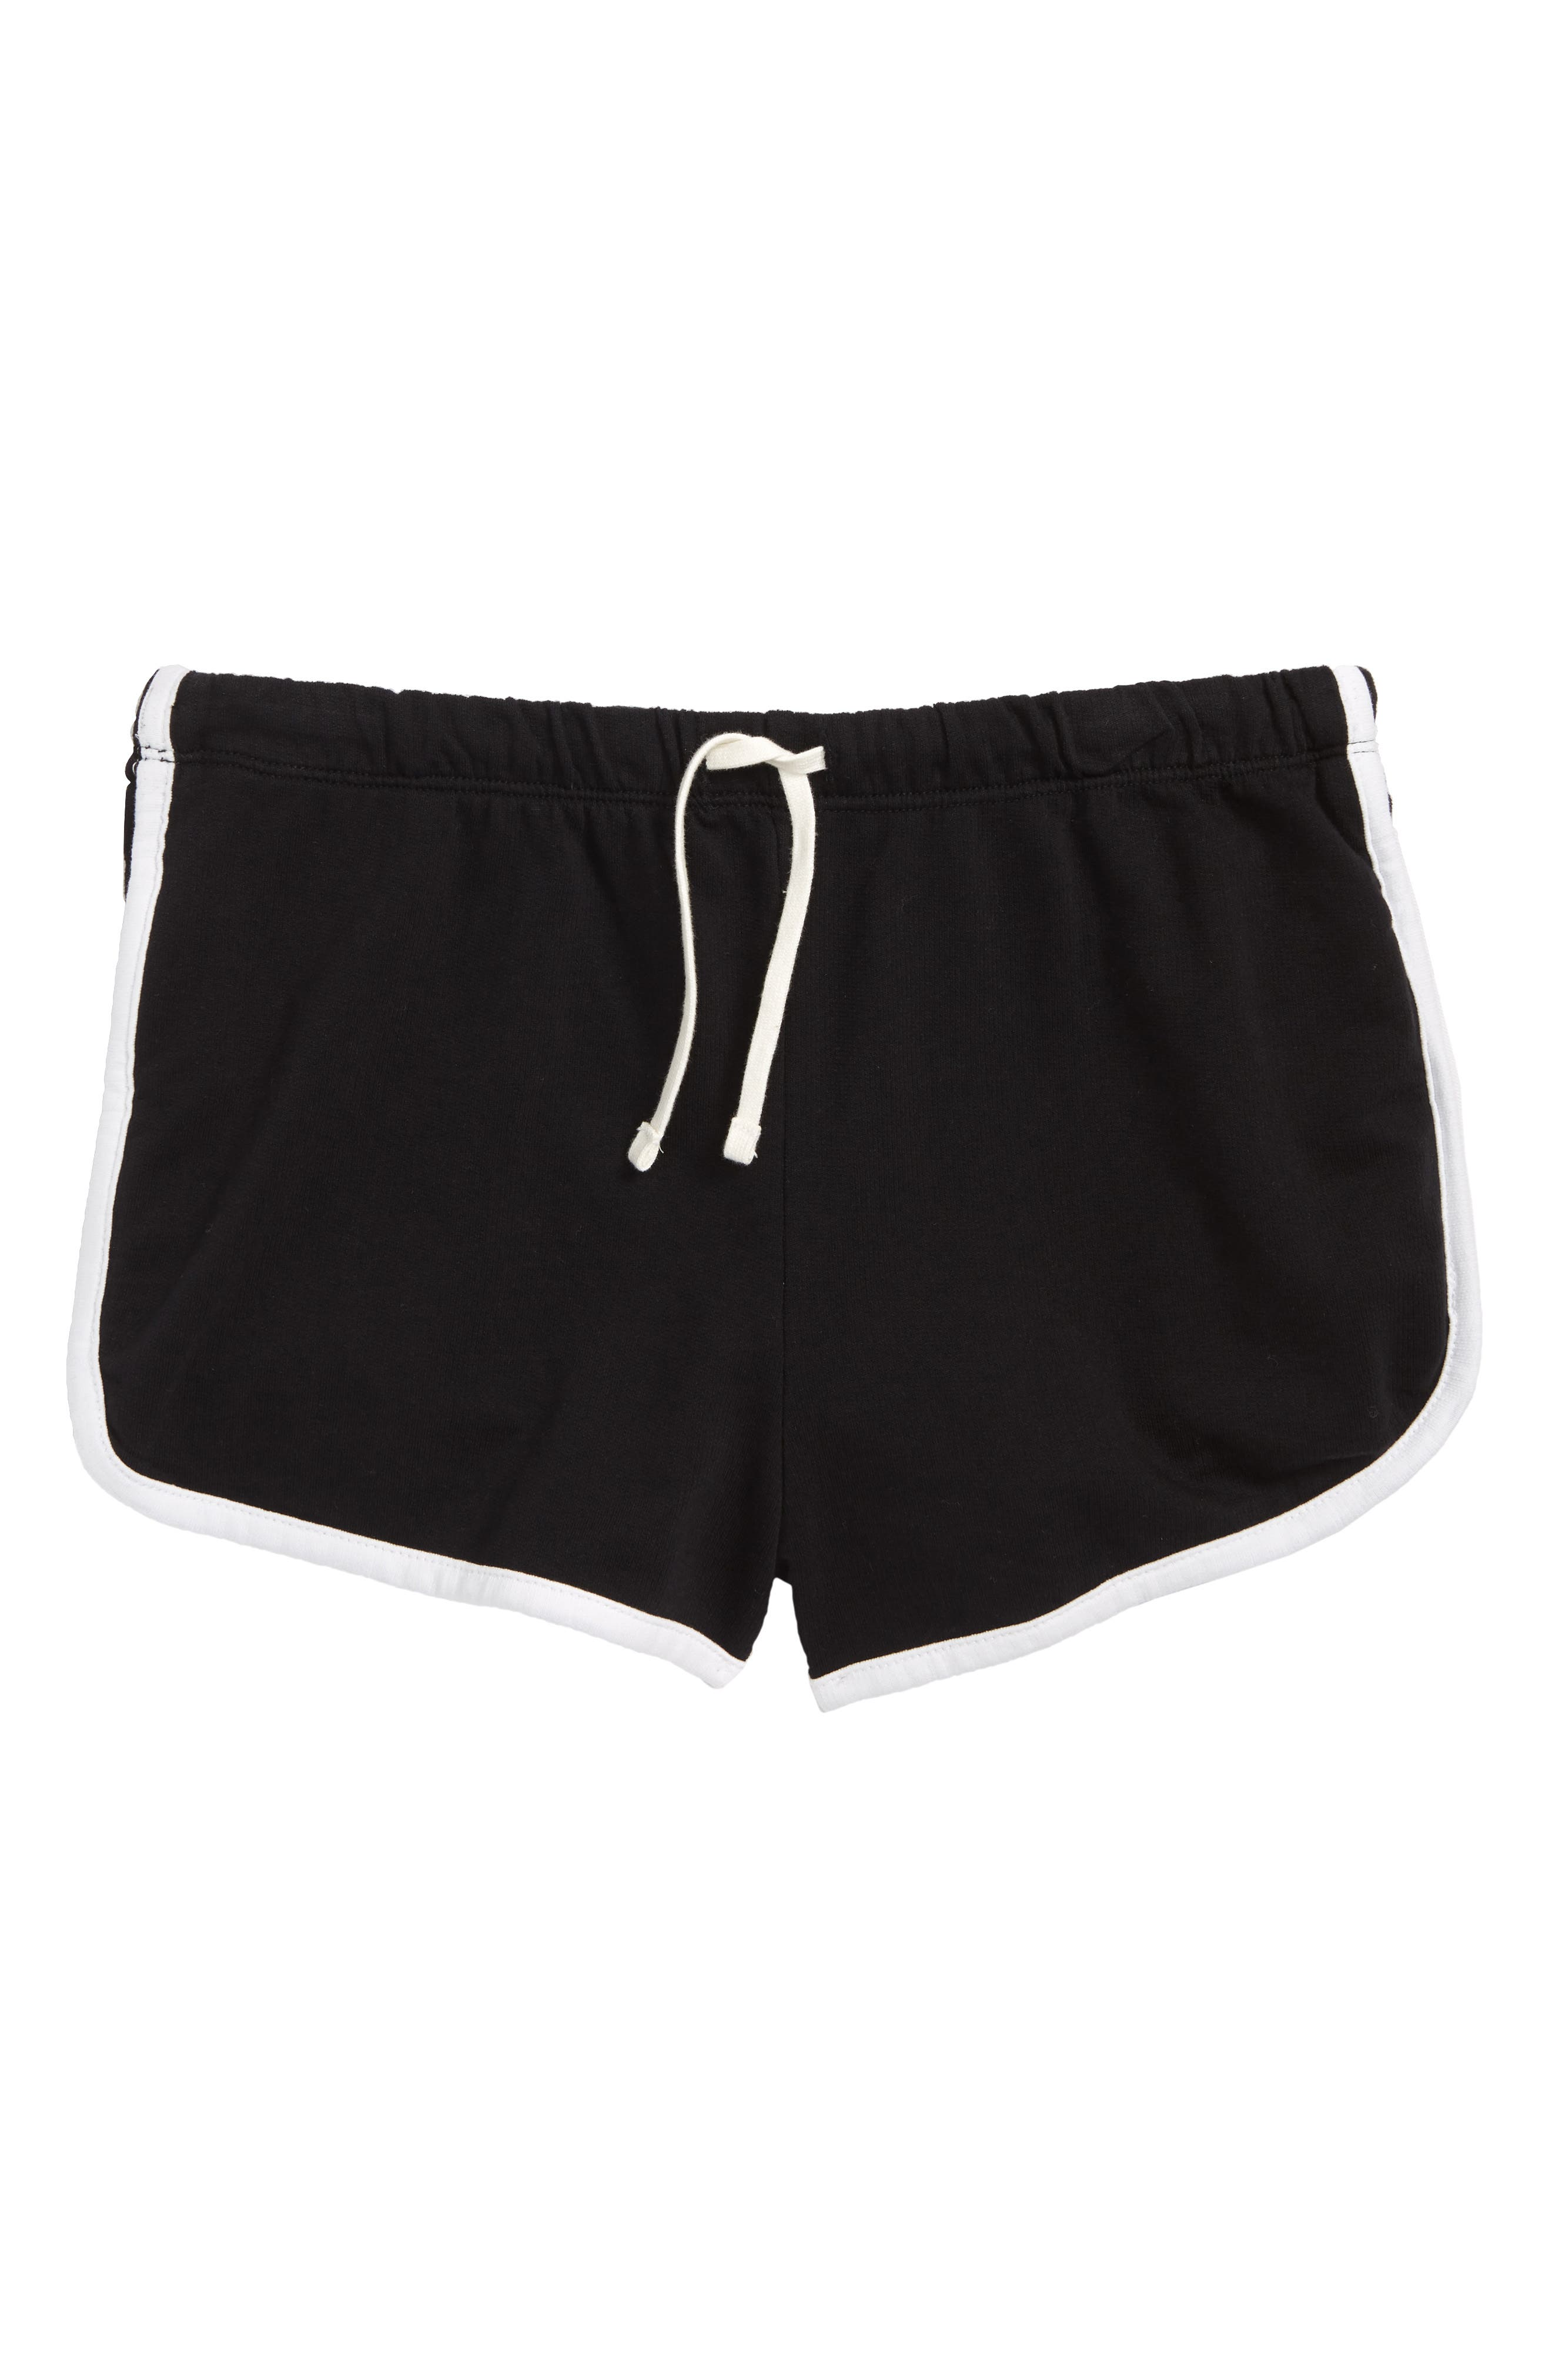 Cotton Dolphin Shorts,                             Main thumbnail 1, color,                             001